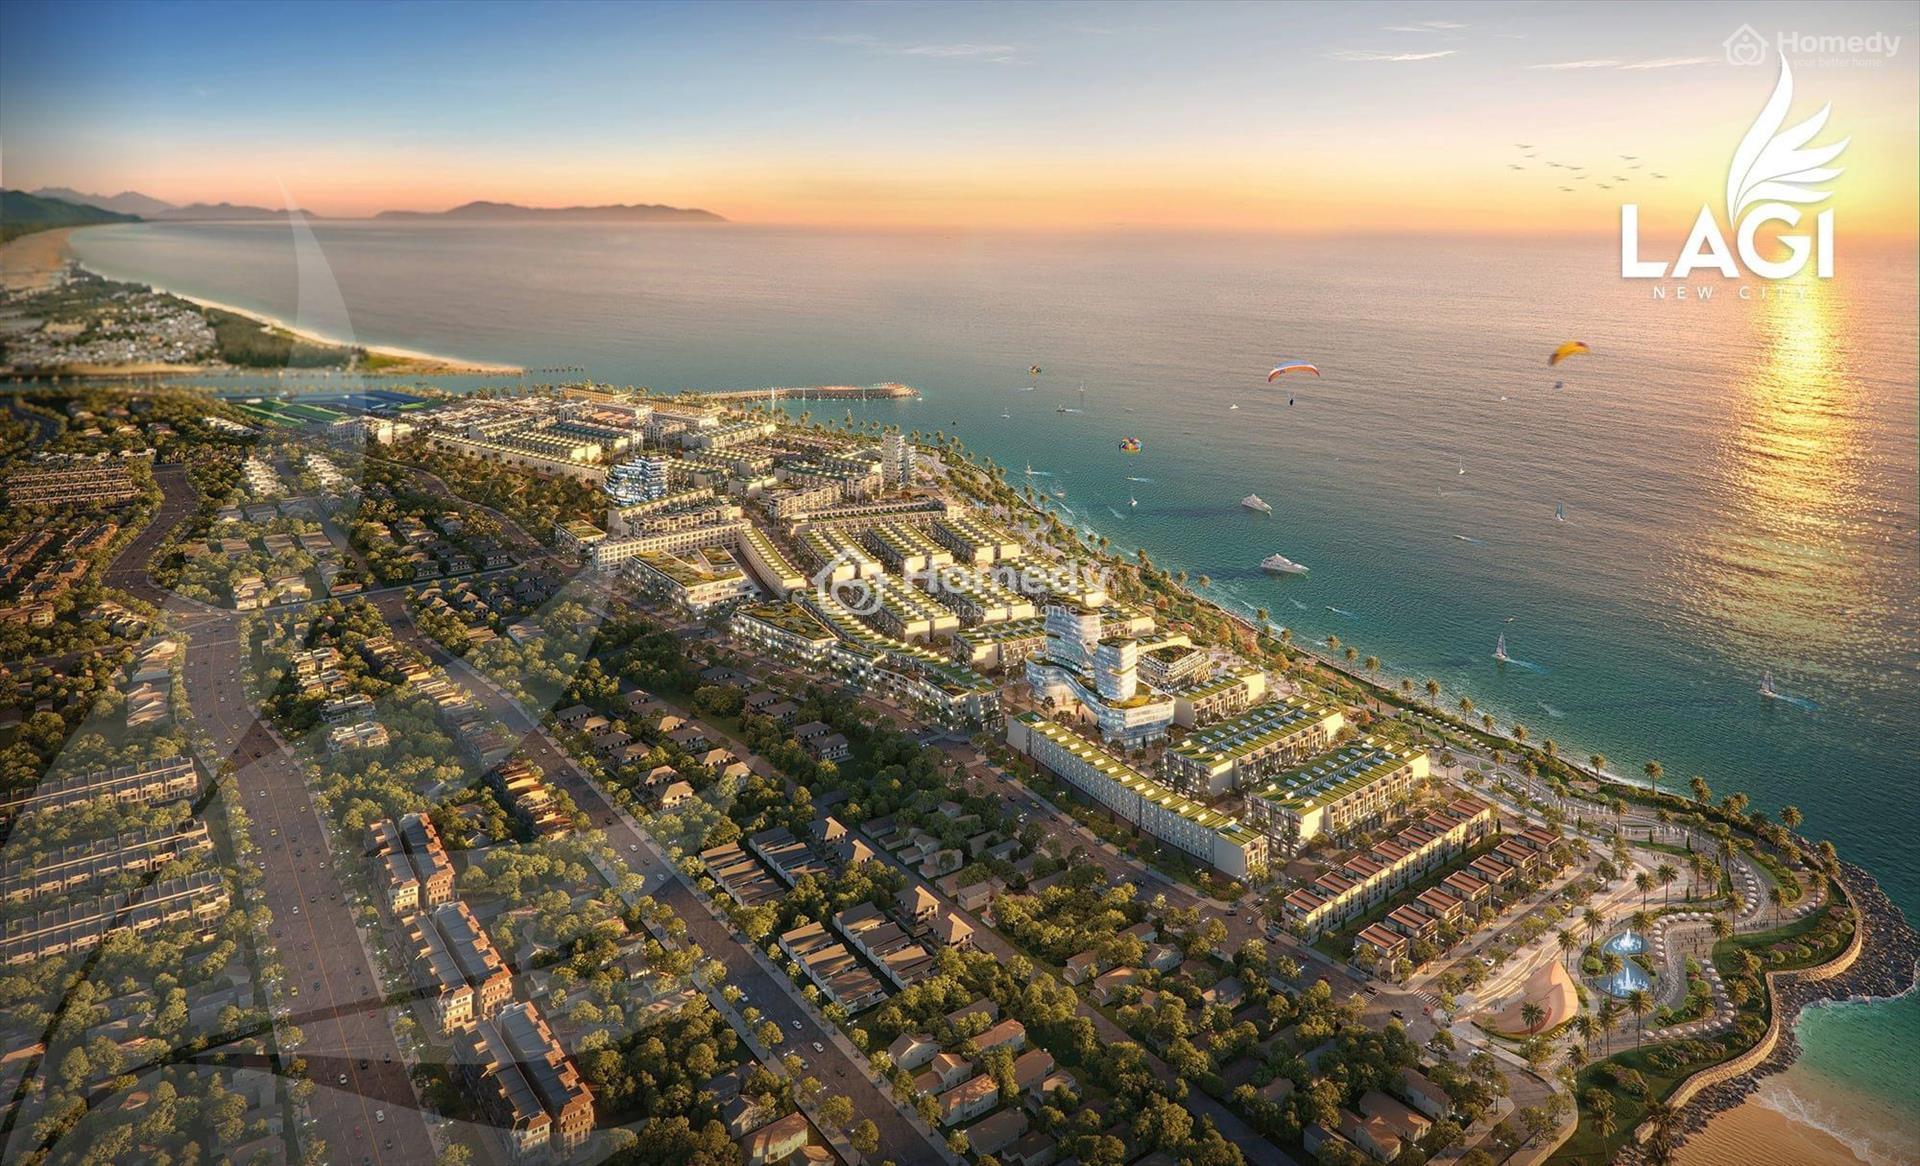 Dự án Lagi New City